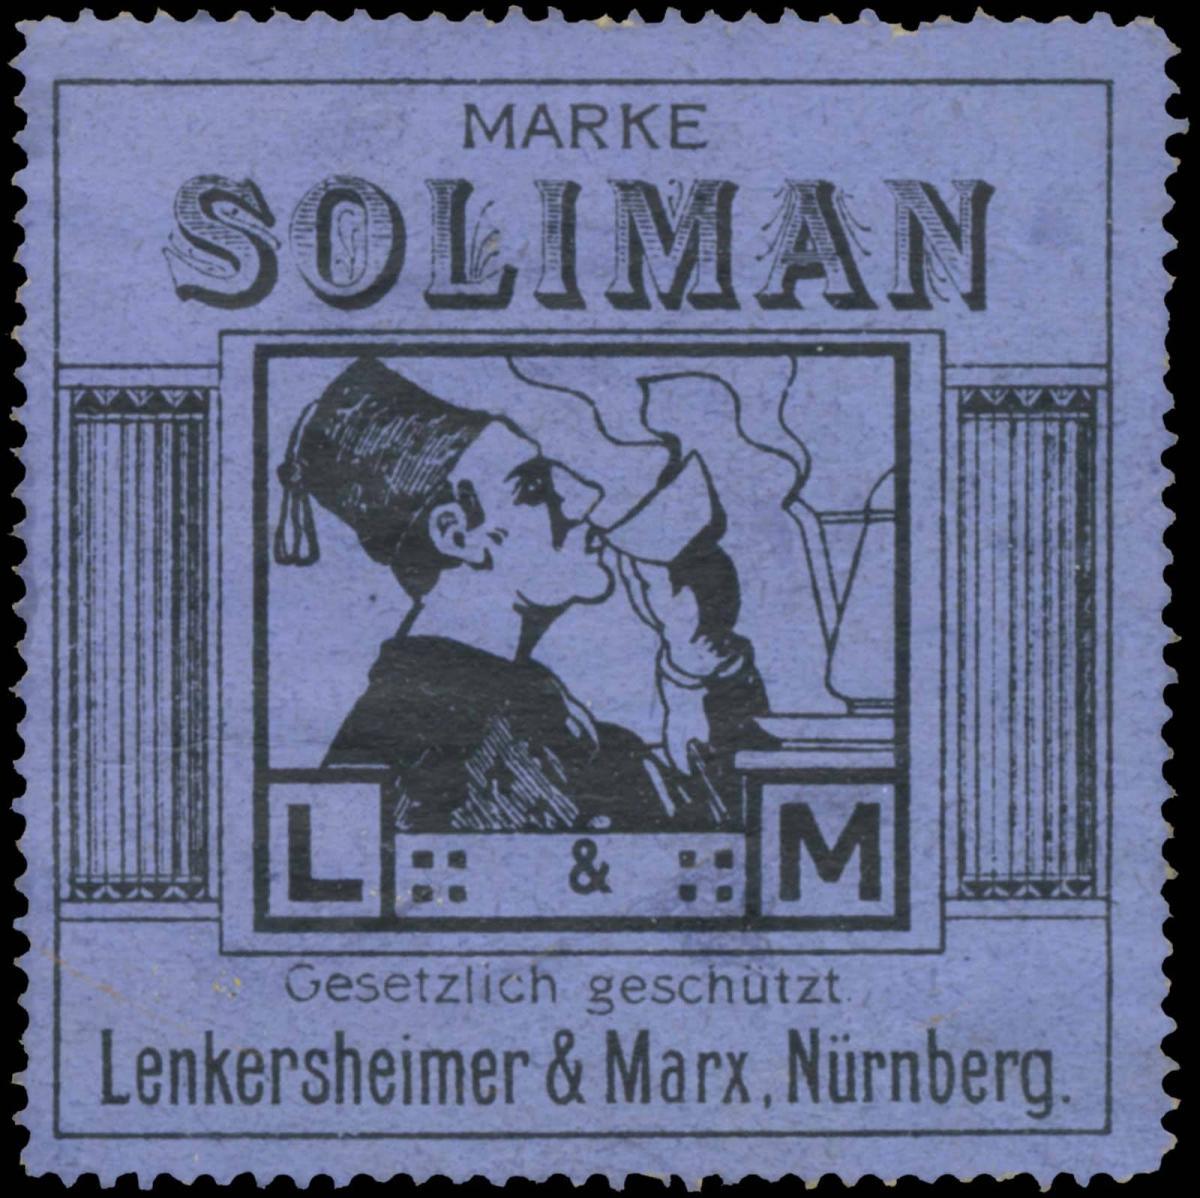 Tee Marke Soliman